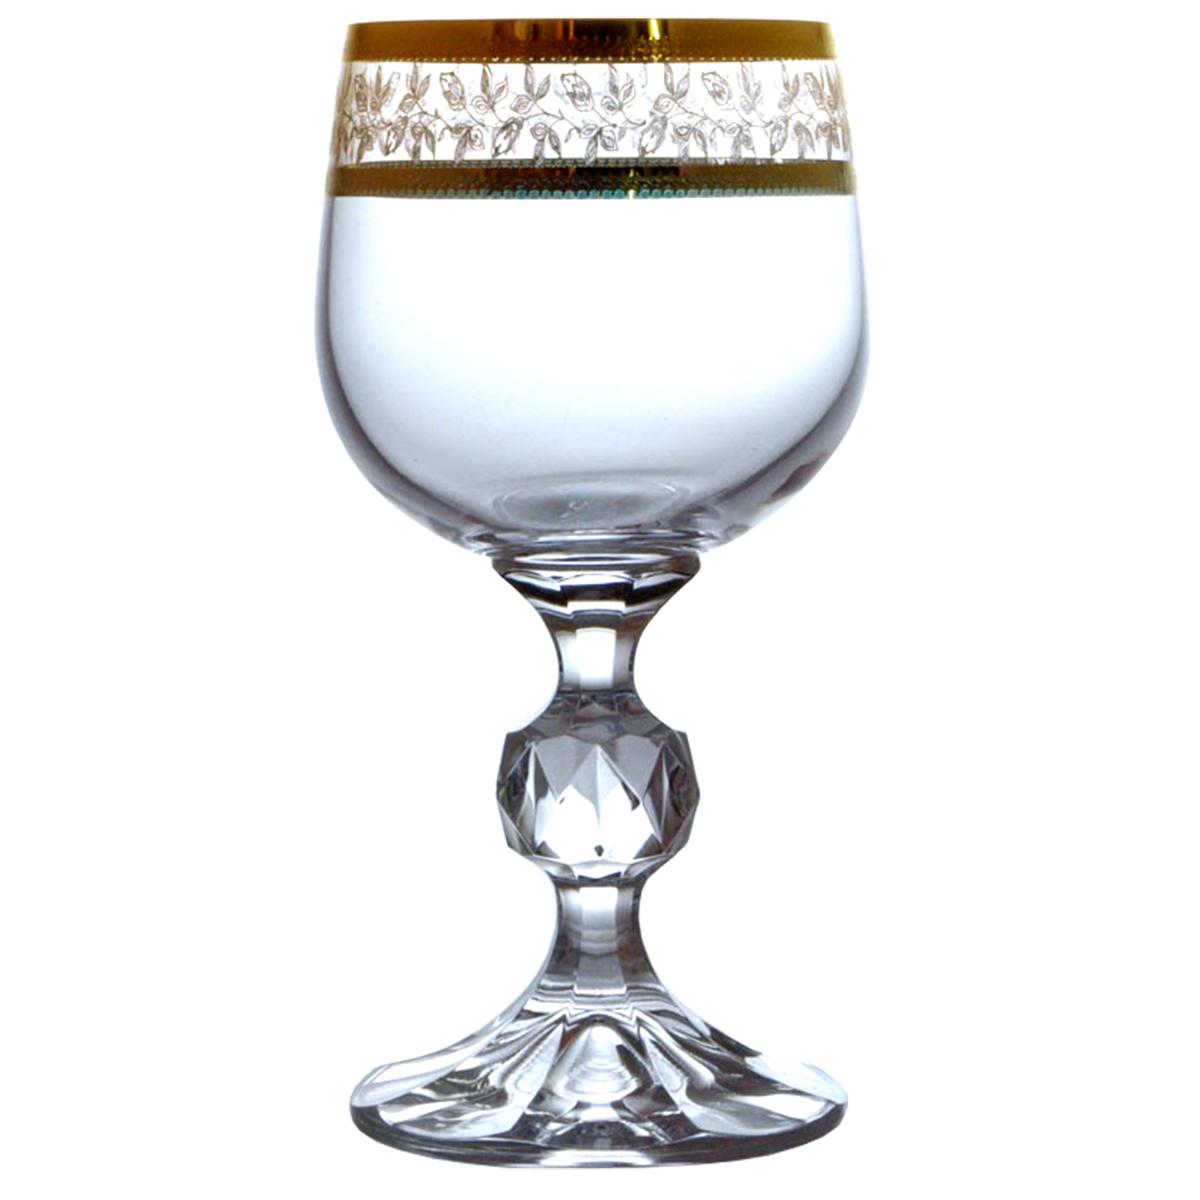 Набор бокалов для вина Bohemia Crystal Клаудия, 230 мл, 6 шт. 40149/43081/230 набор бокалов для вина bohemia crystal attimo 500 мл 6 шт